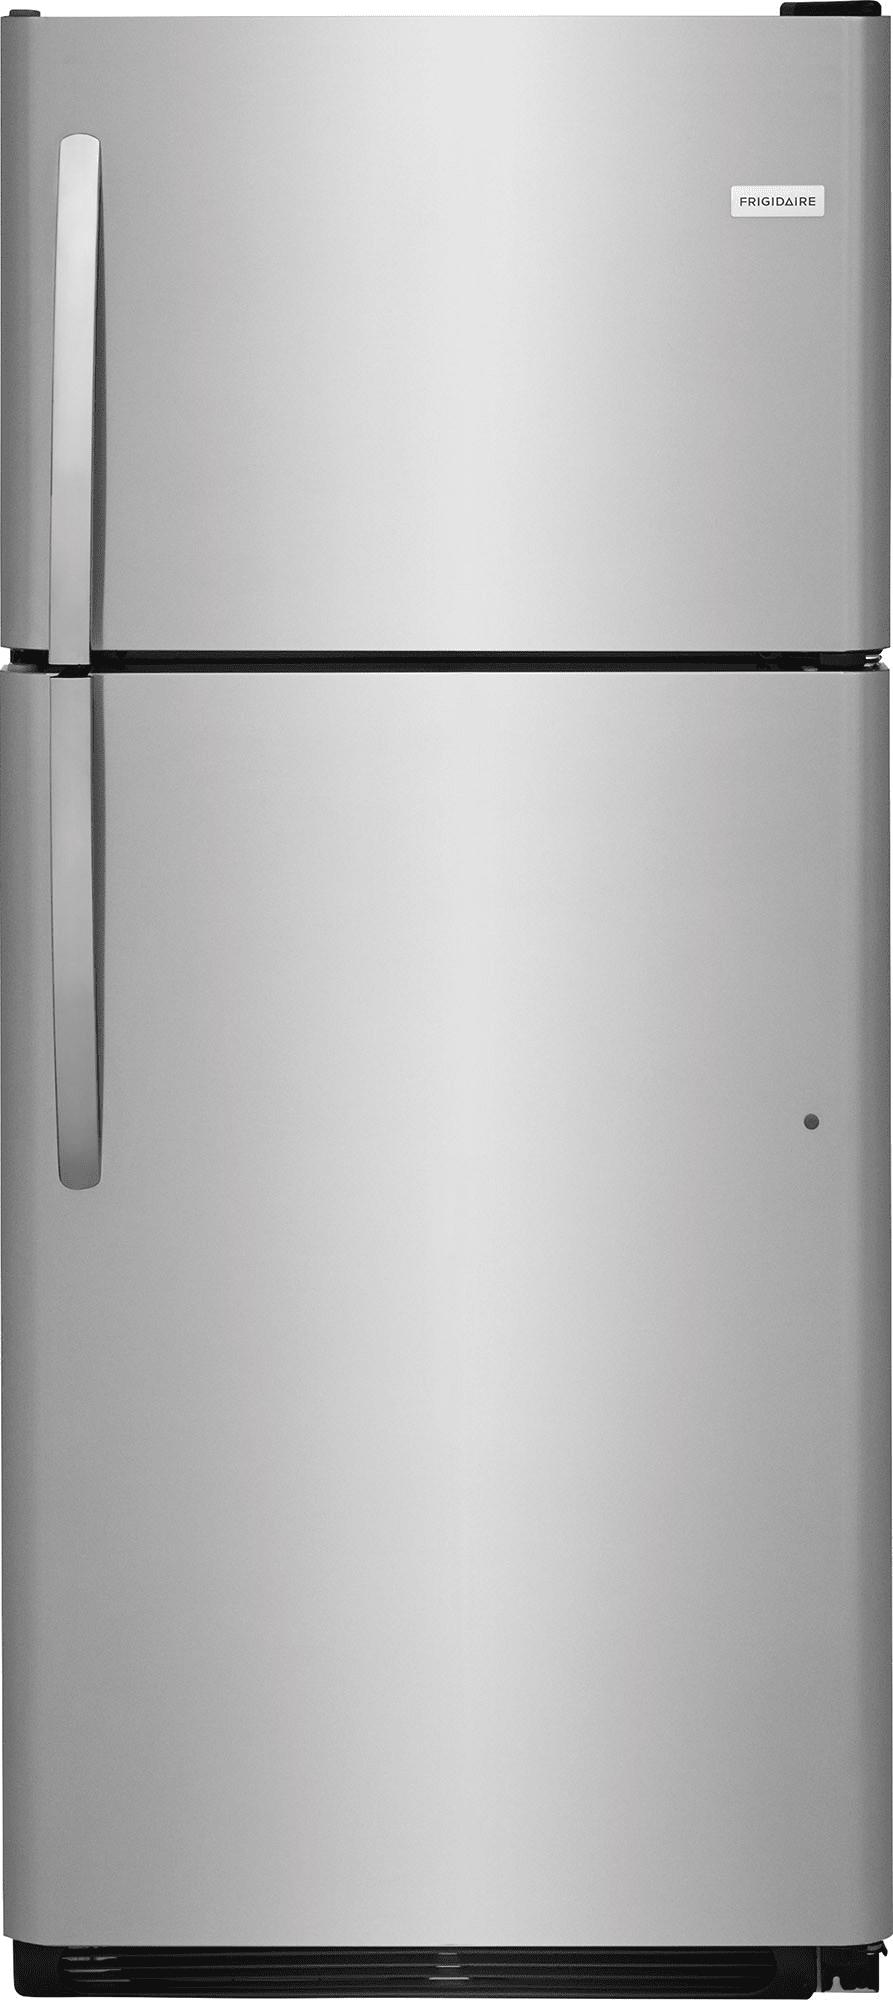 Frigidaire Ffht2021ts 30 Inch Top Freezer Refrigerator